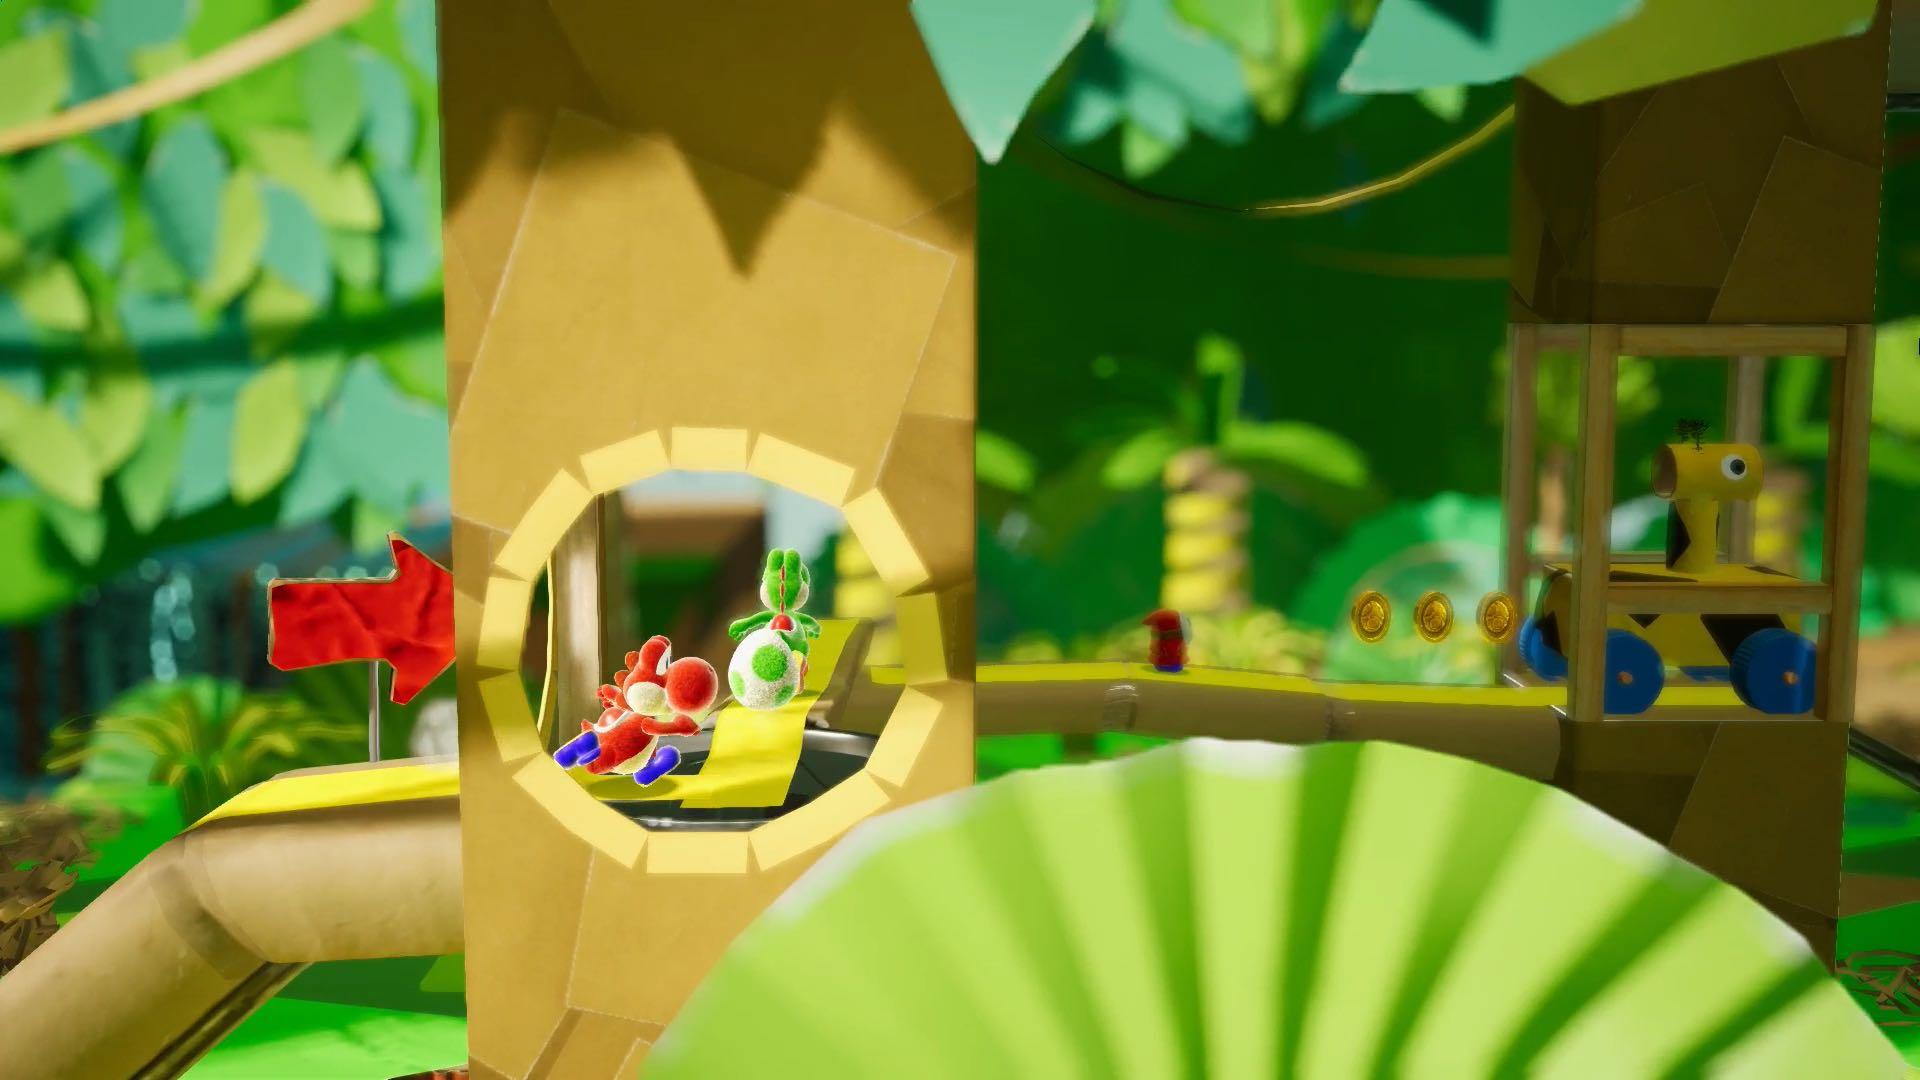 Yoshi Switch probabile presenza al Nintendo Direct